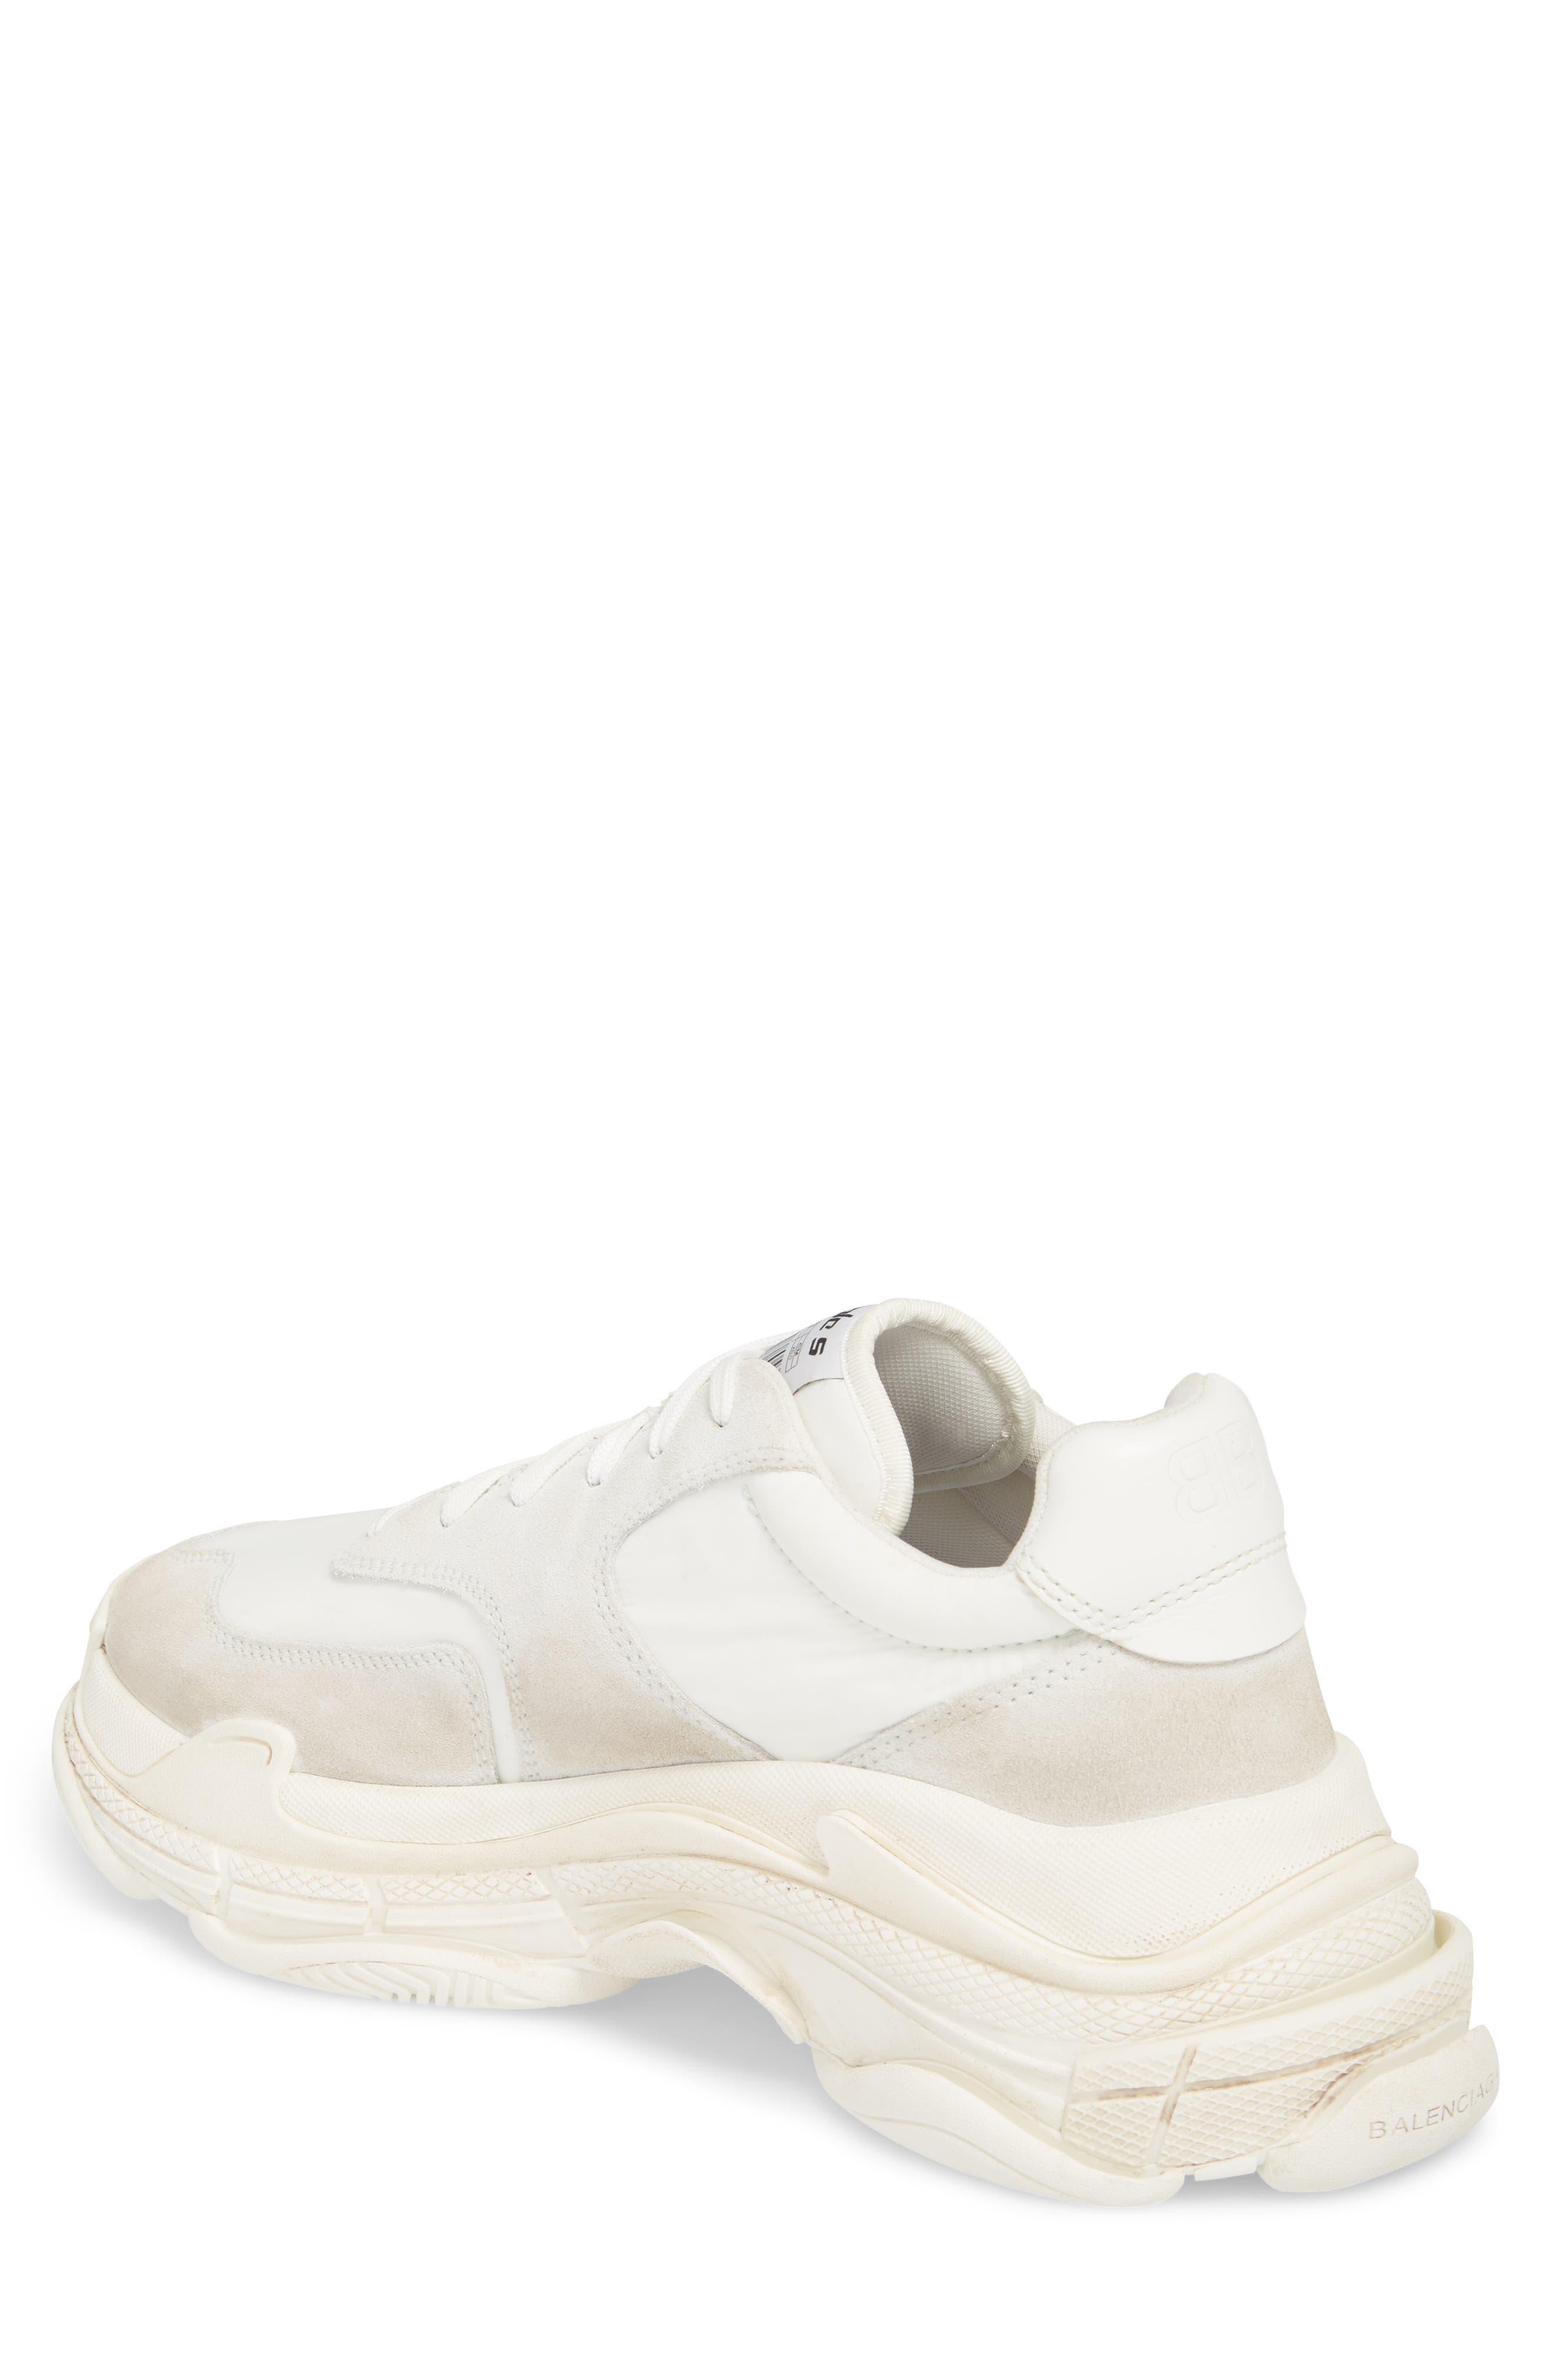 Triple S Retro Sneaker,                             Alternate thumbnail 2, color,                             Blanc White